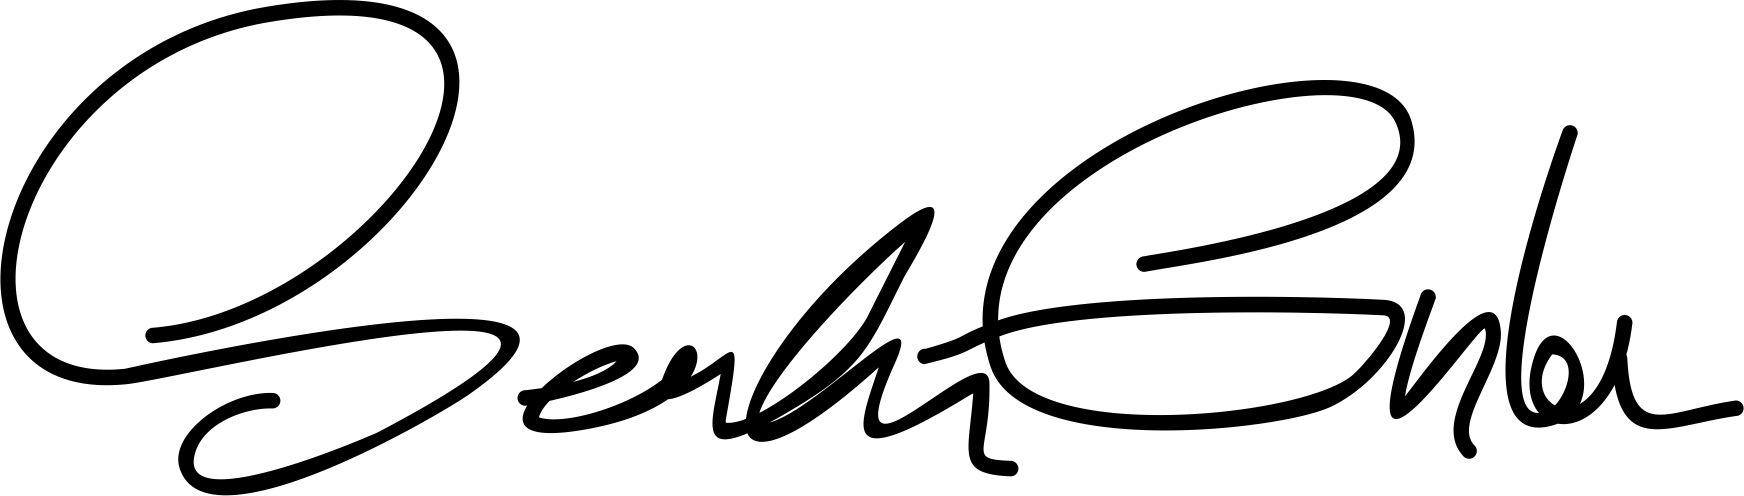 serdar gunler's Signature